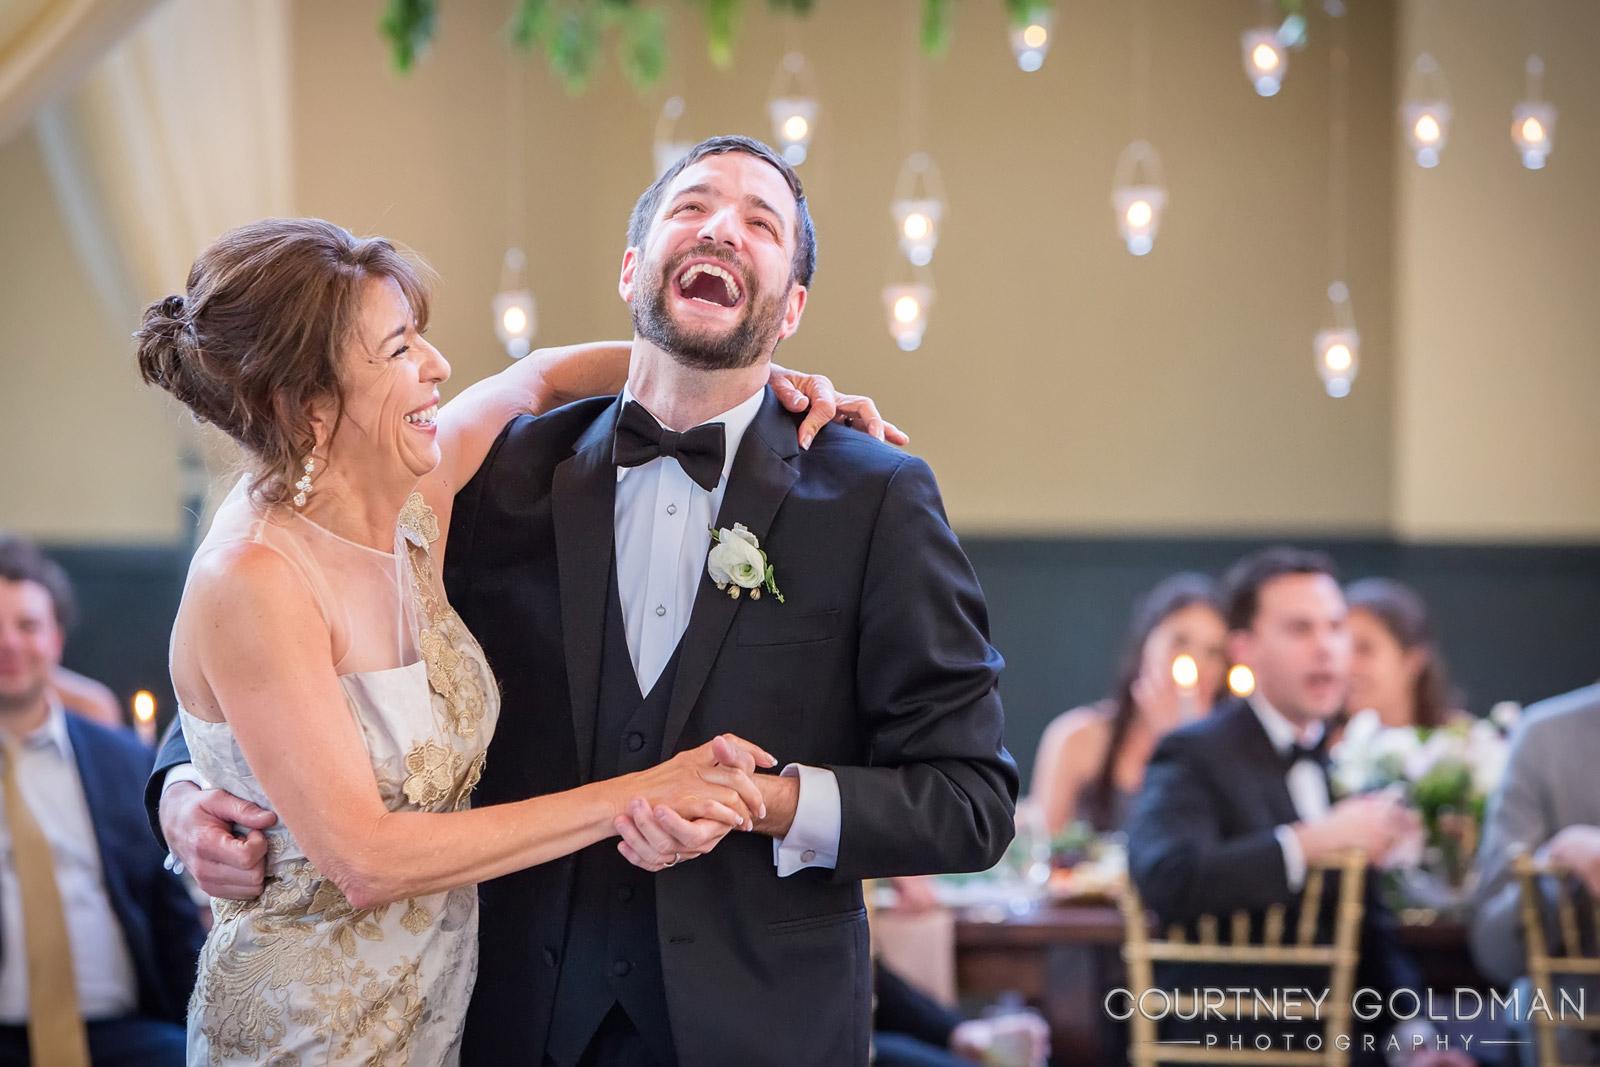 Atlanta-Wedding-Photography-by-Courtney-Goldman-29.jpg